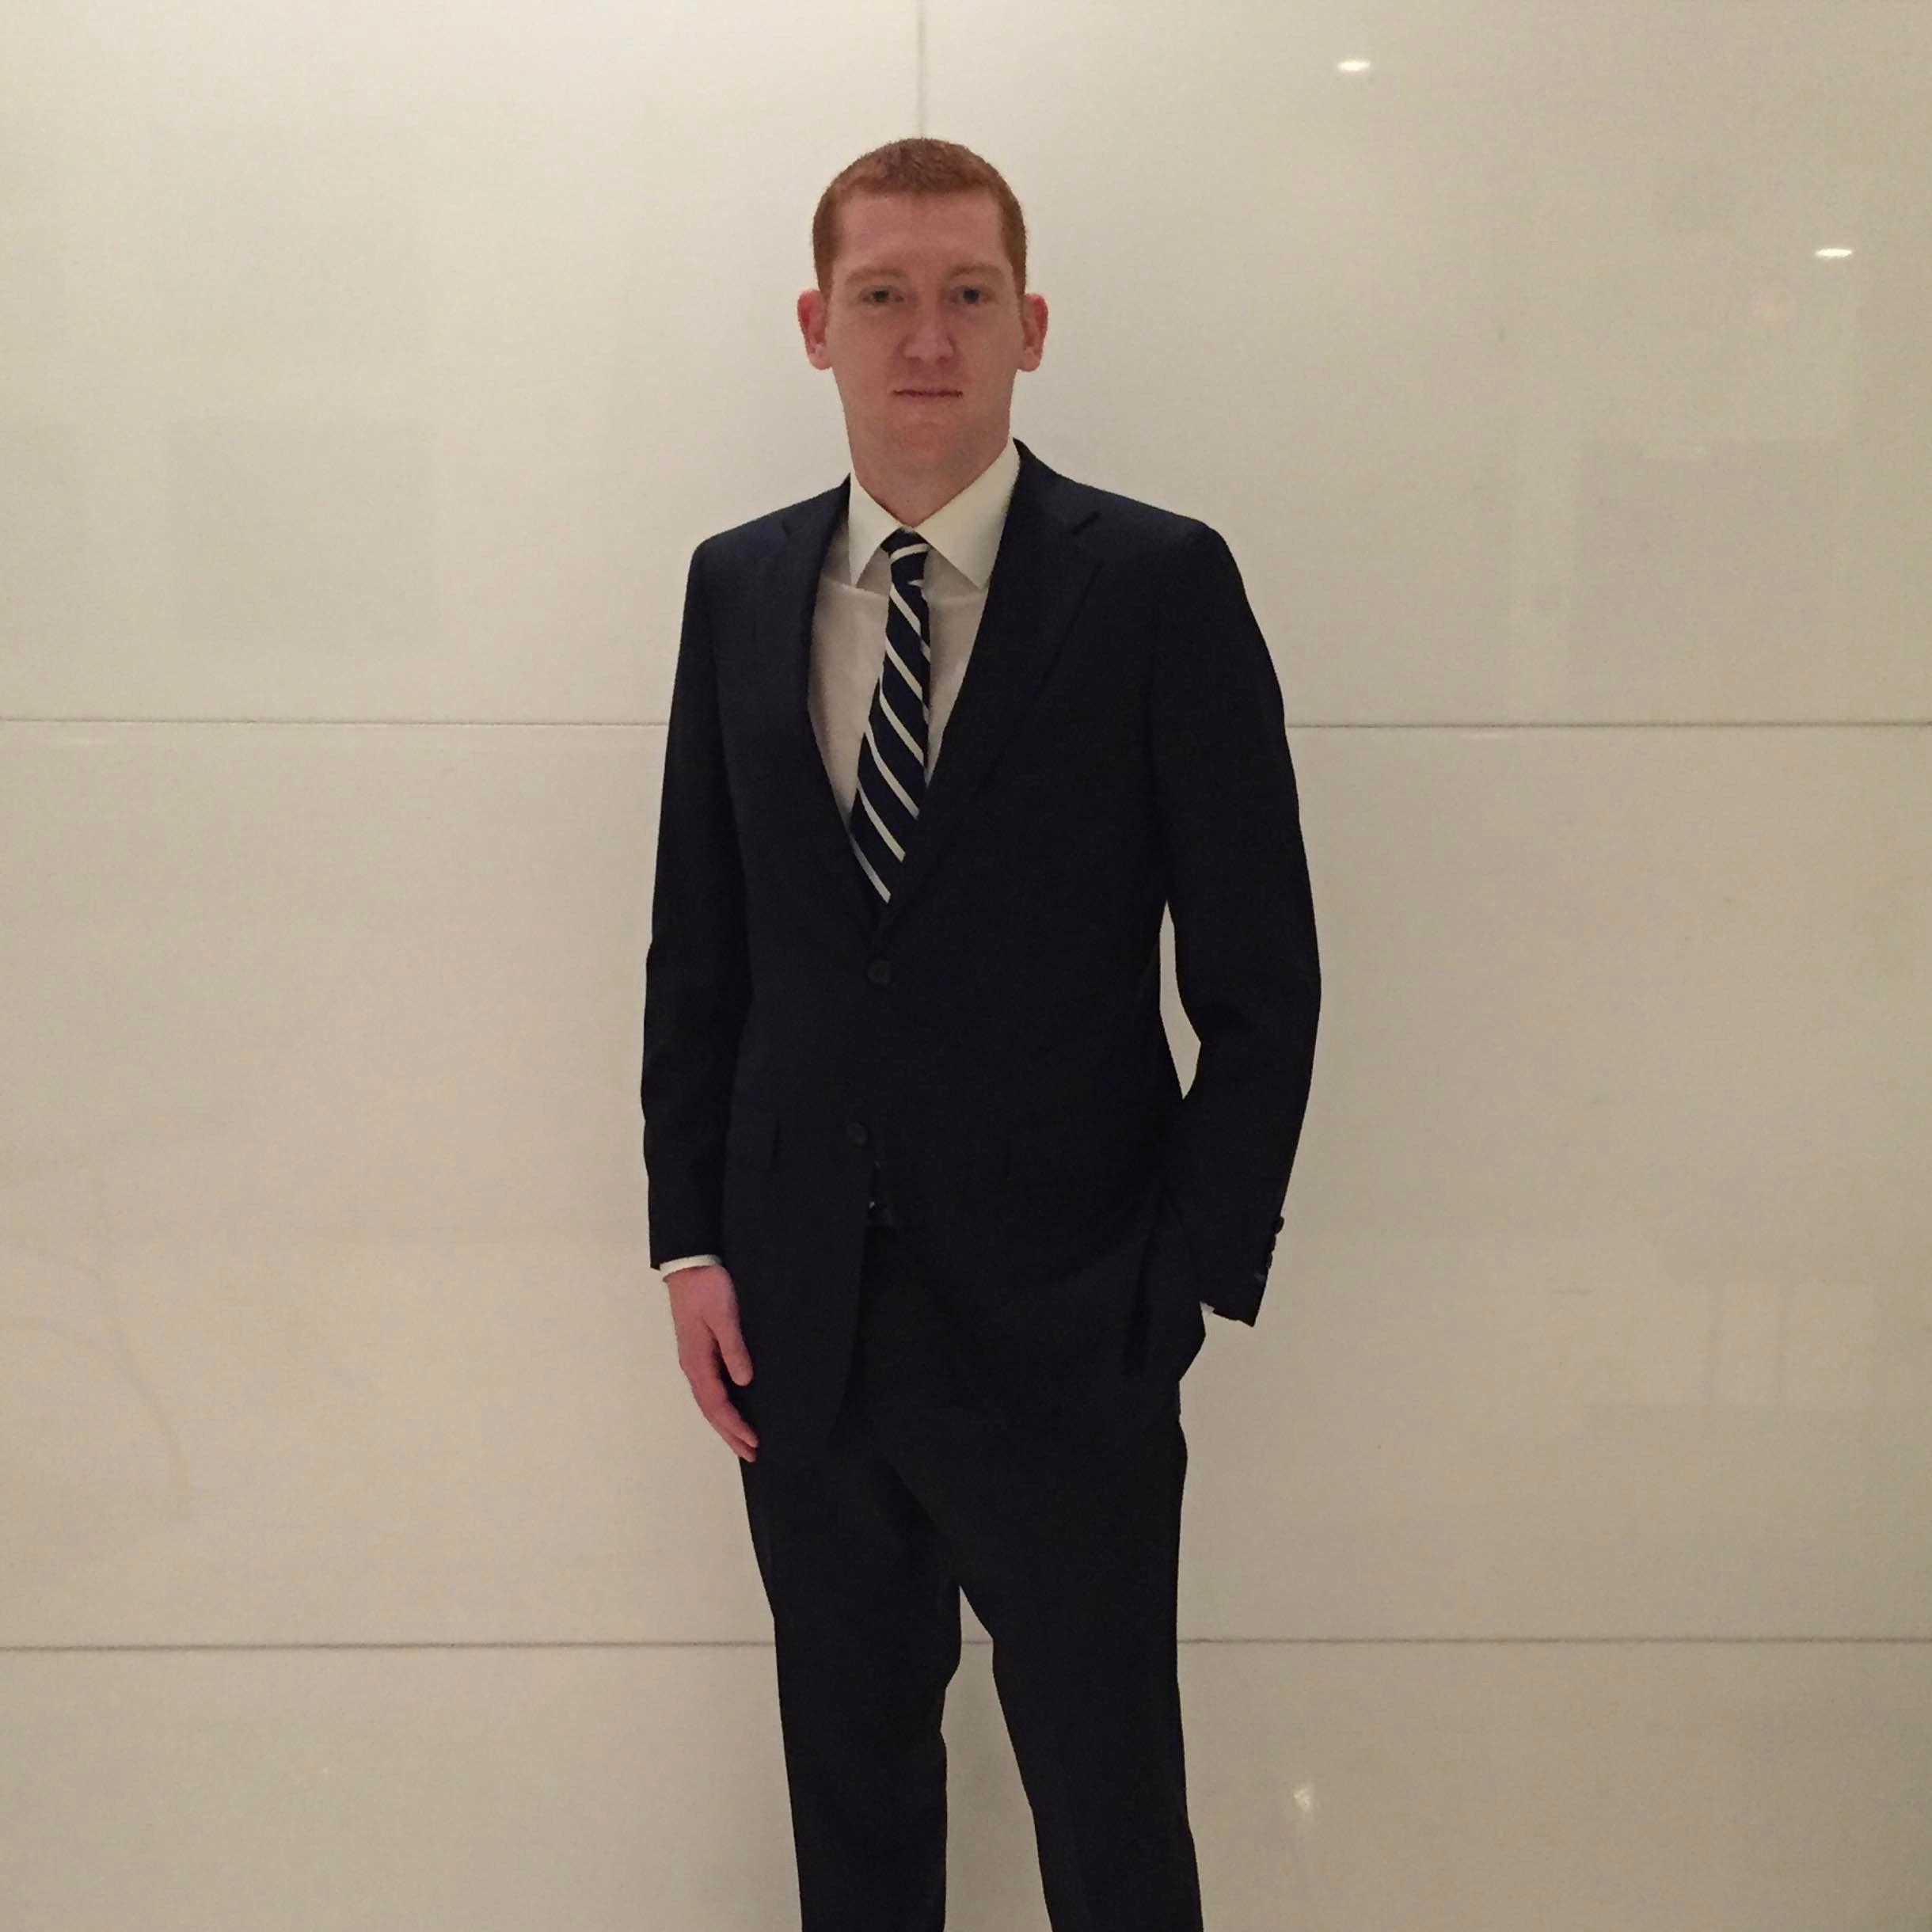 VICE PRESIDENT EMERITUS Michael Webert Veteran, US Navy, Future Judge Advocate